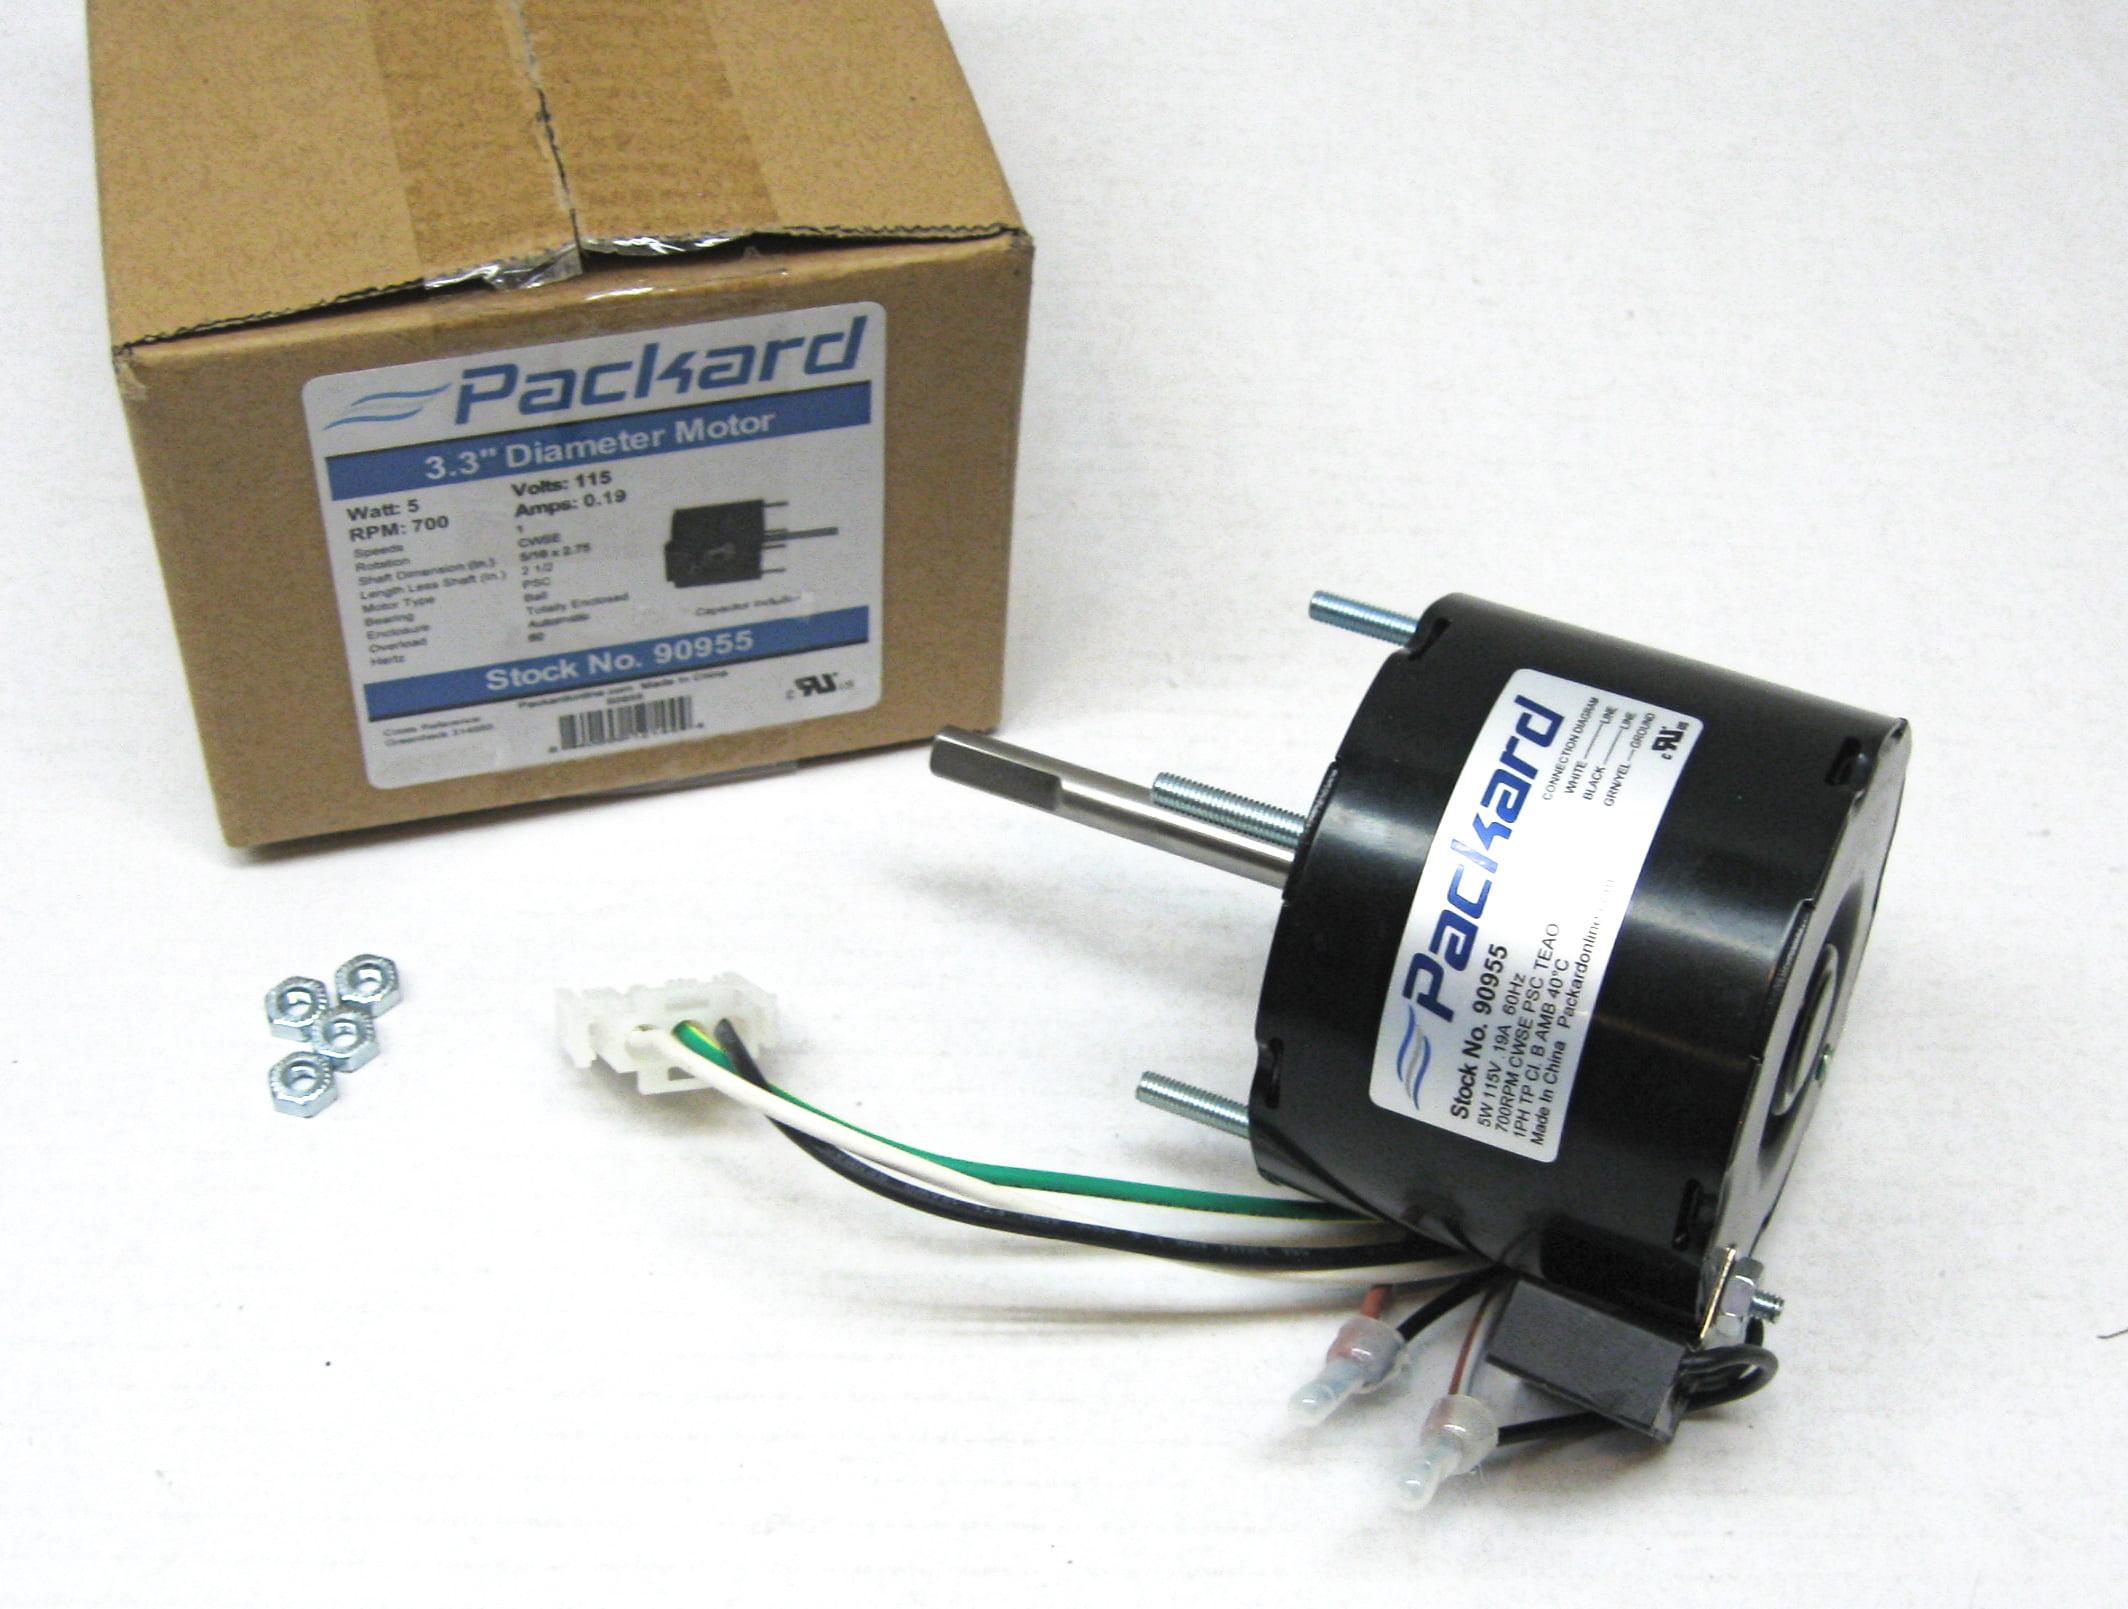 Packard 90955 Motor For Greenheck 314955 5 Watt 115 60 Volts 700 46 Wiring Diagram Rpm